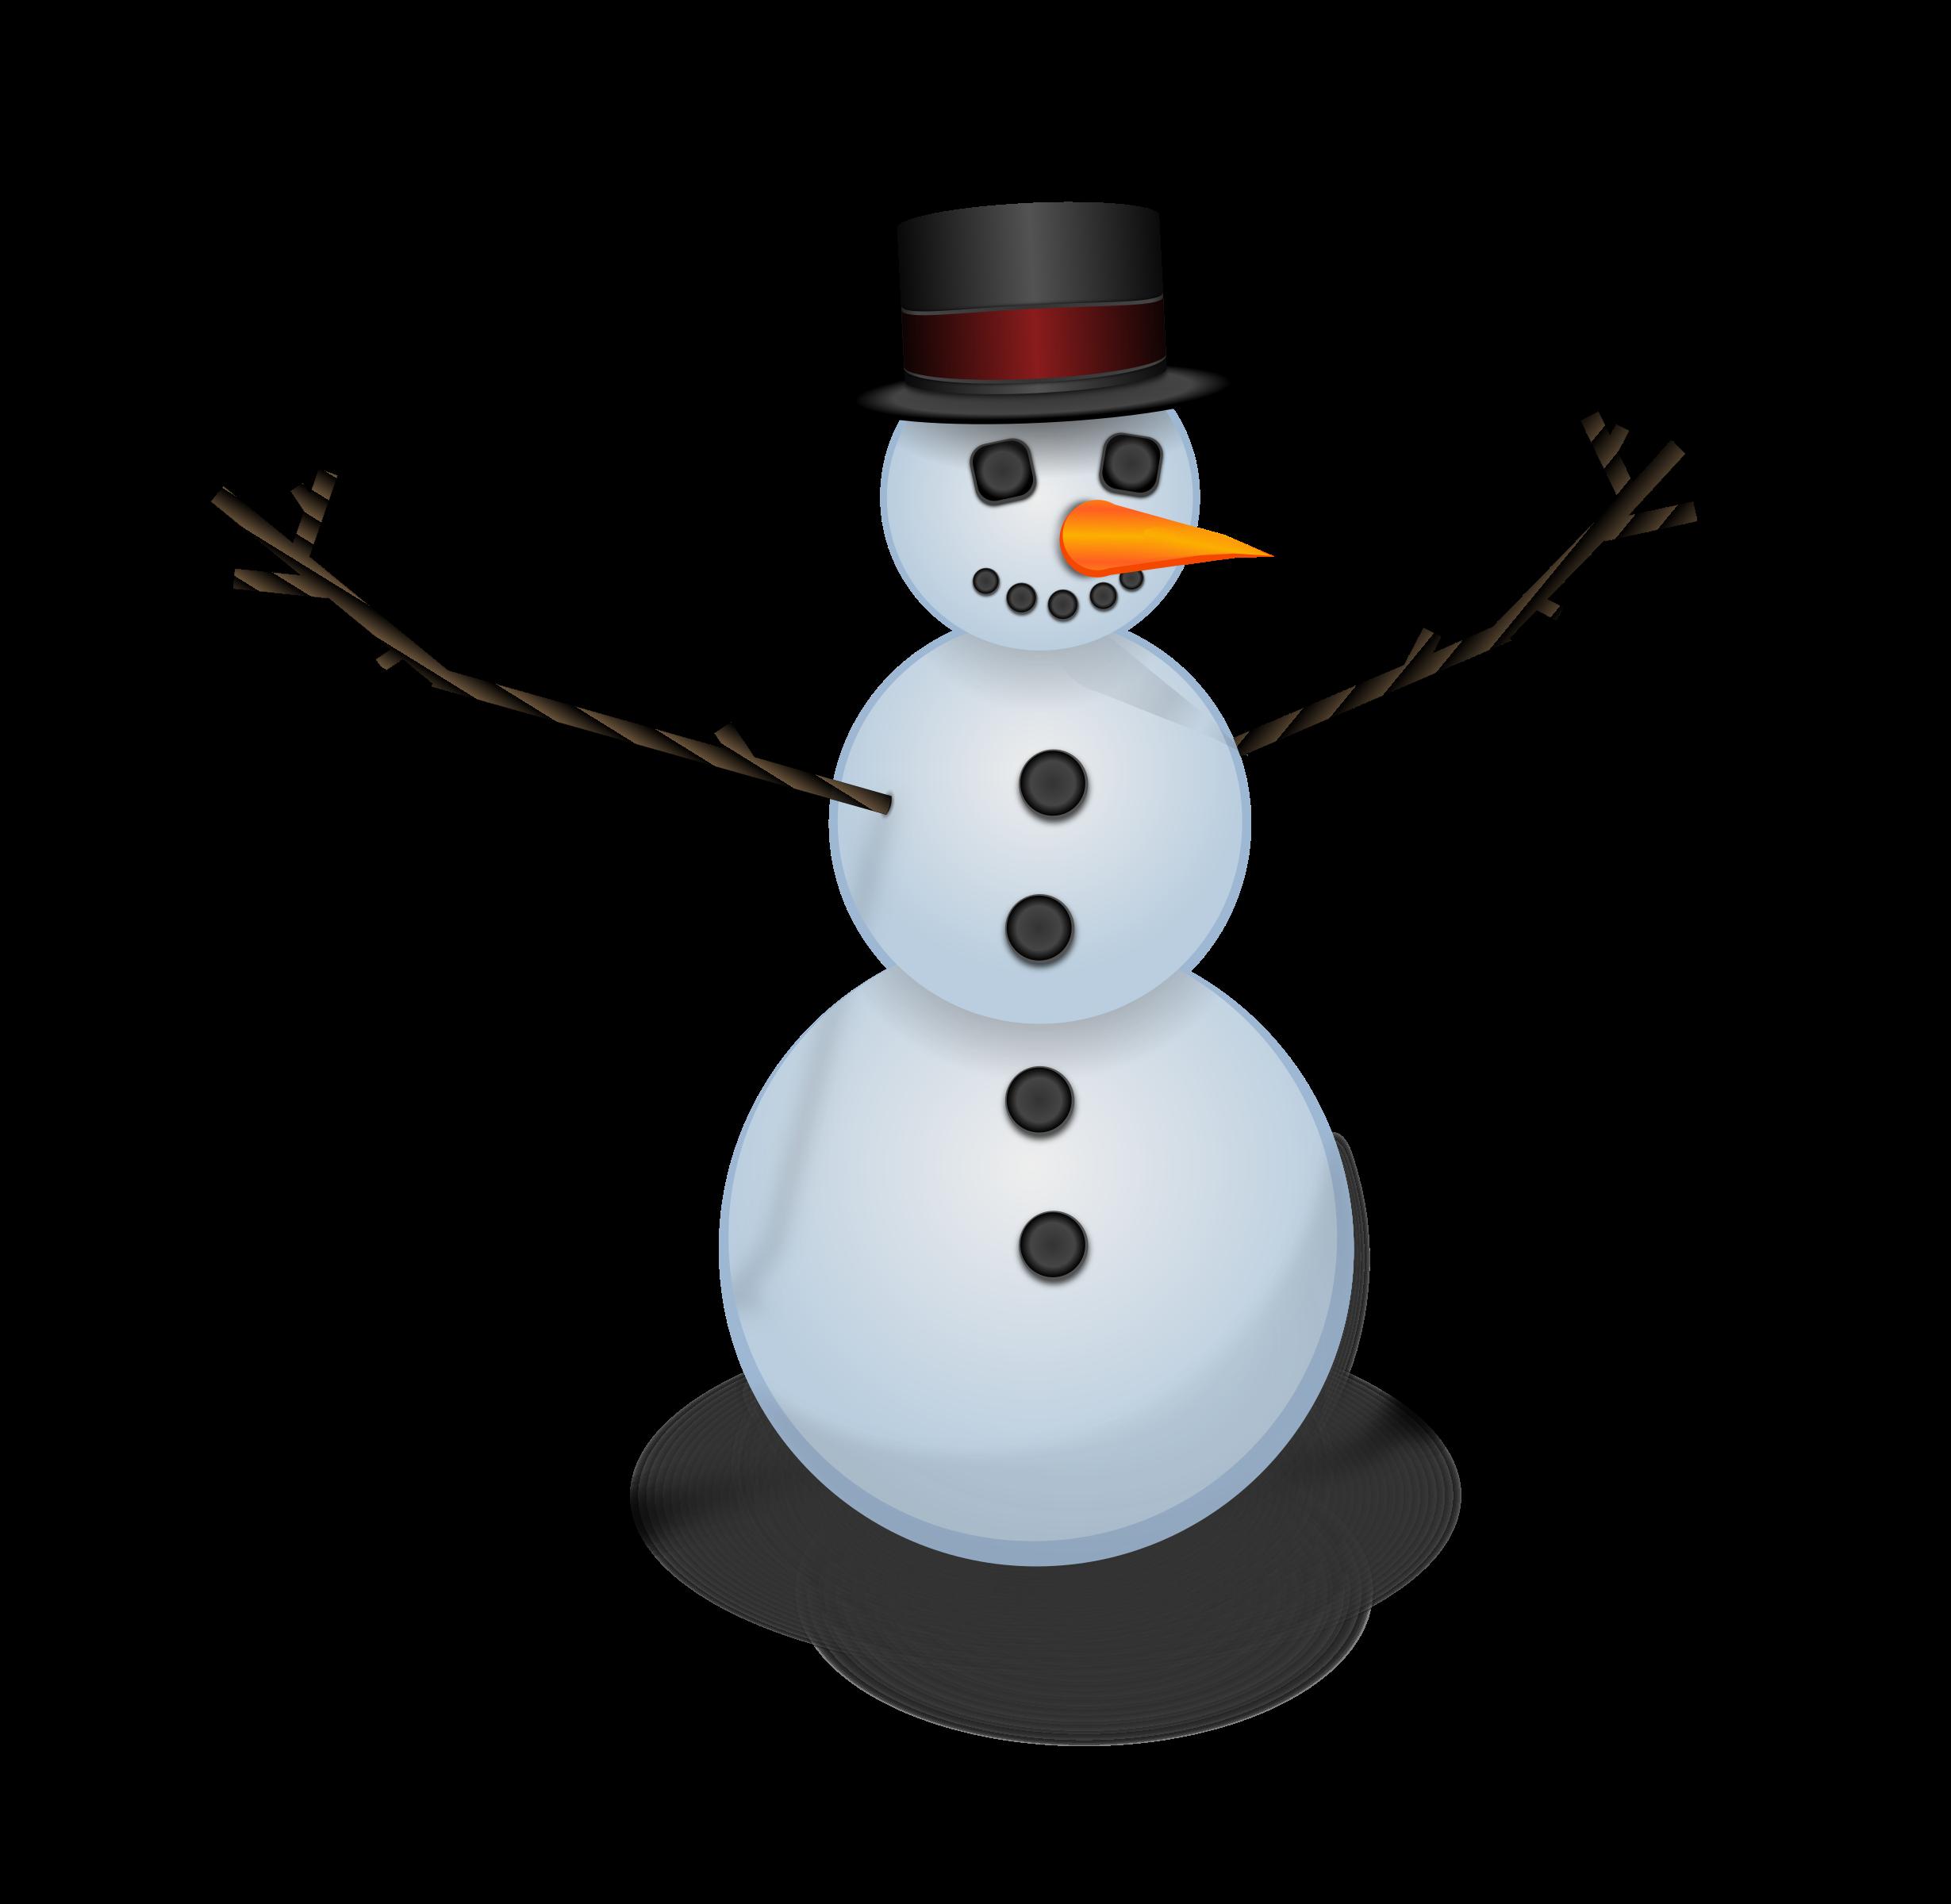 Snow man with hat. Coal clipart snowman